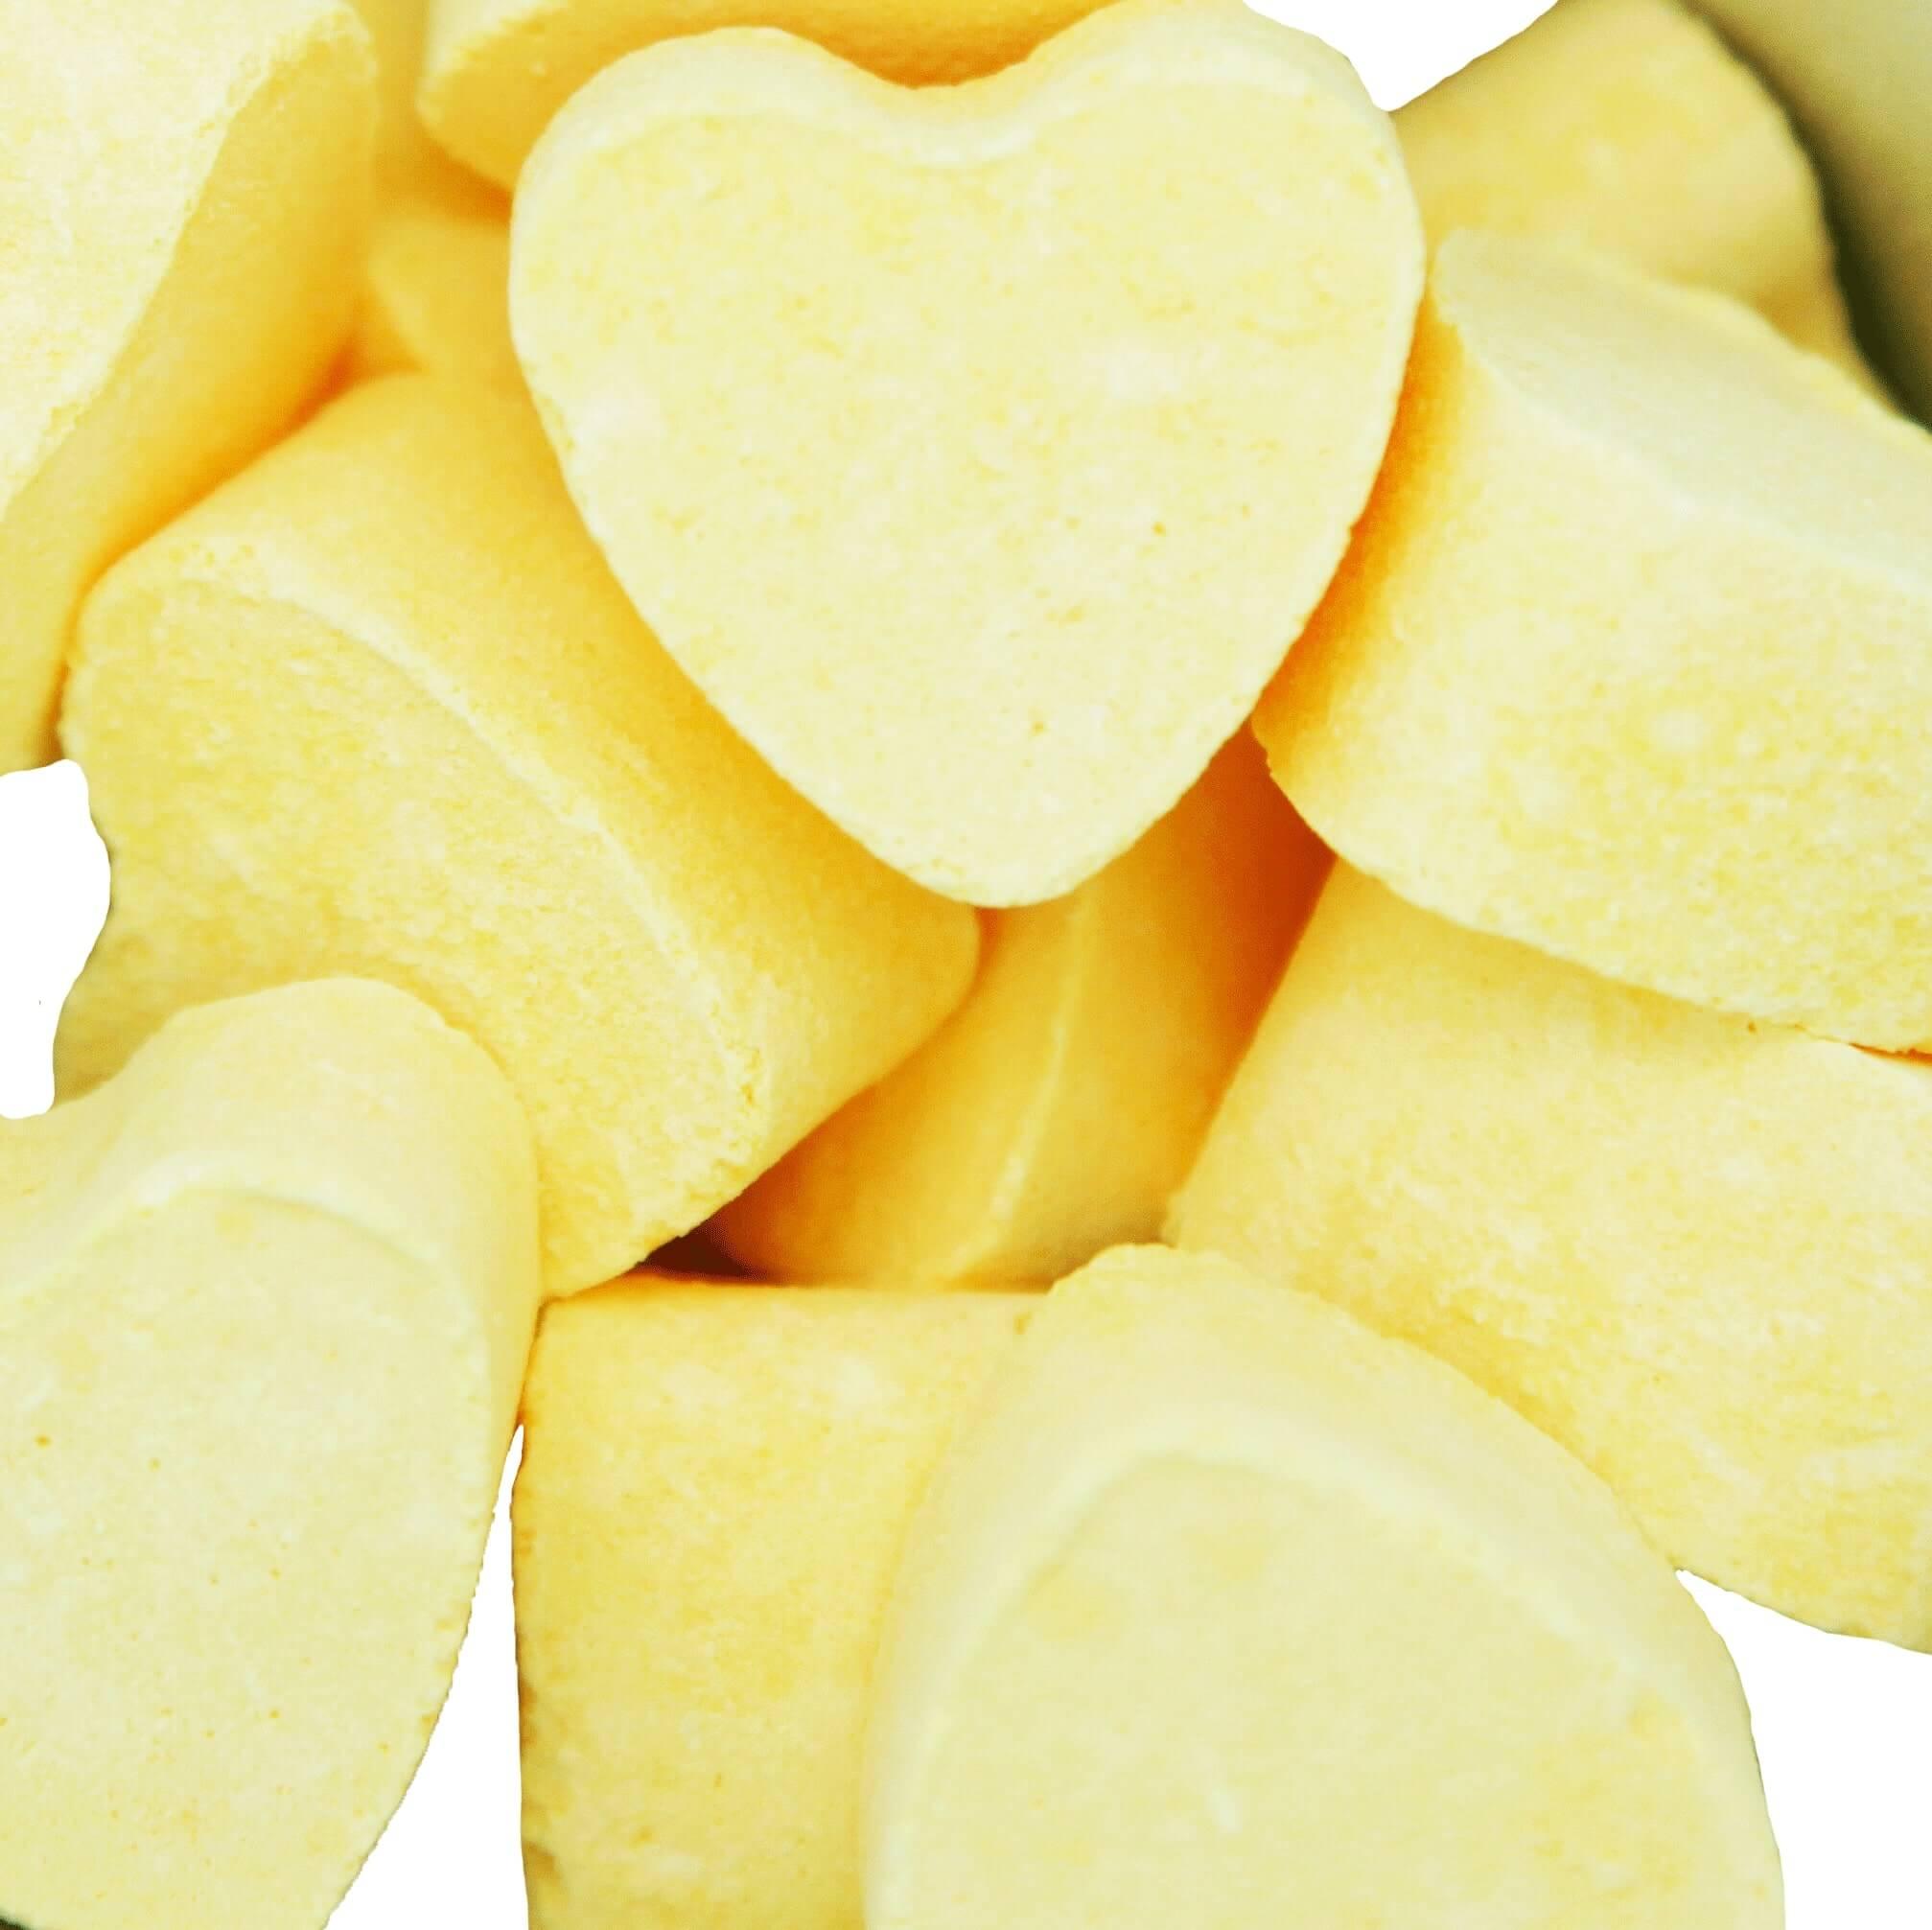 Badekugel Herz 10 Stk. - Zitrone